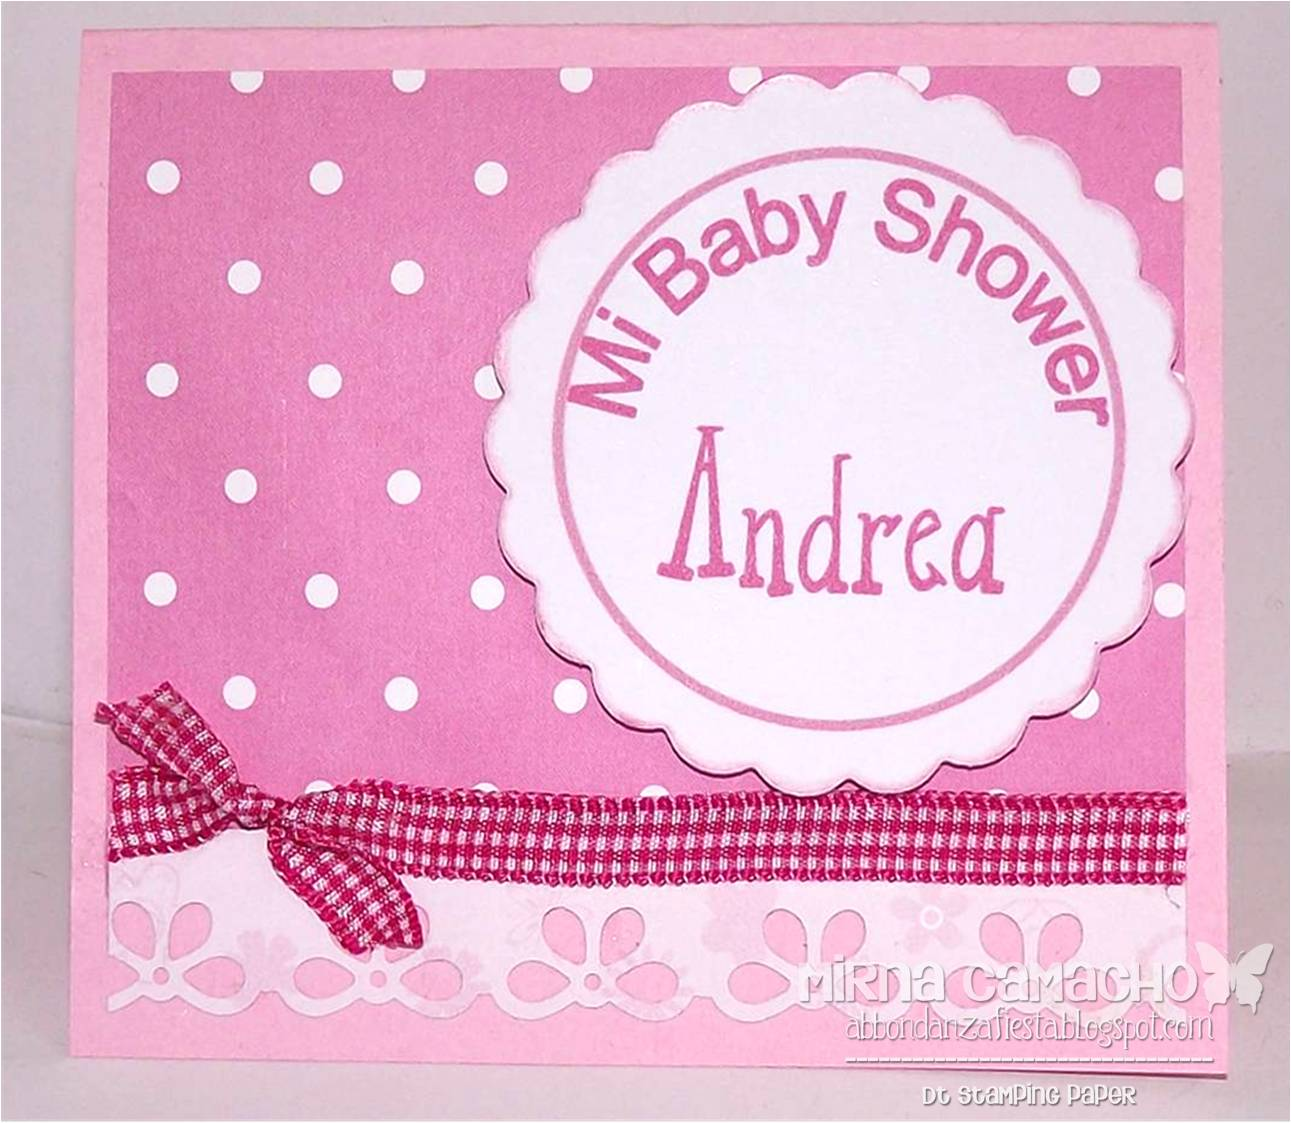 d5f1beb0cd84a Stamping Paper  Invitación para Baby Shower